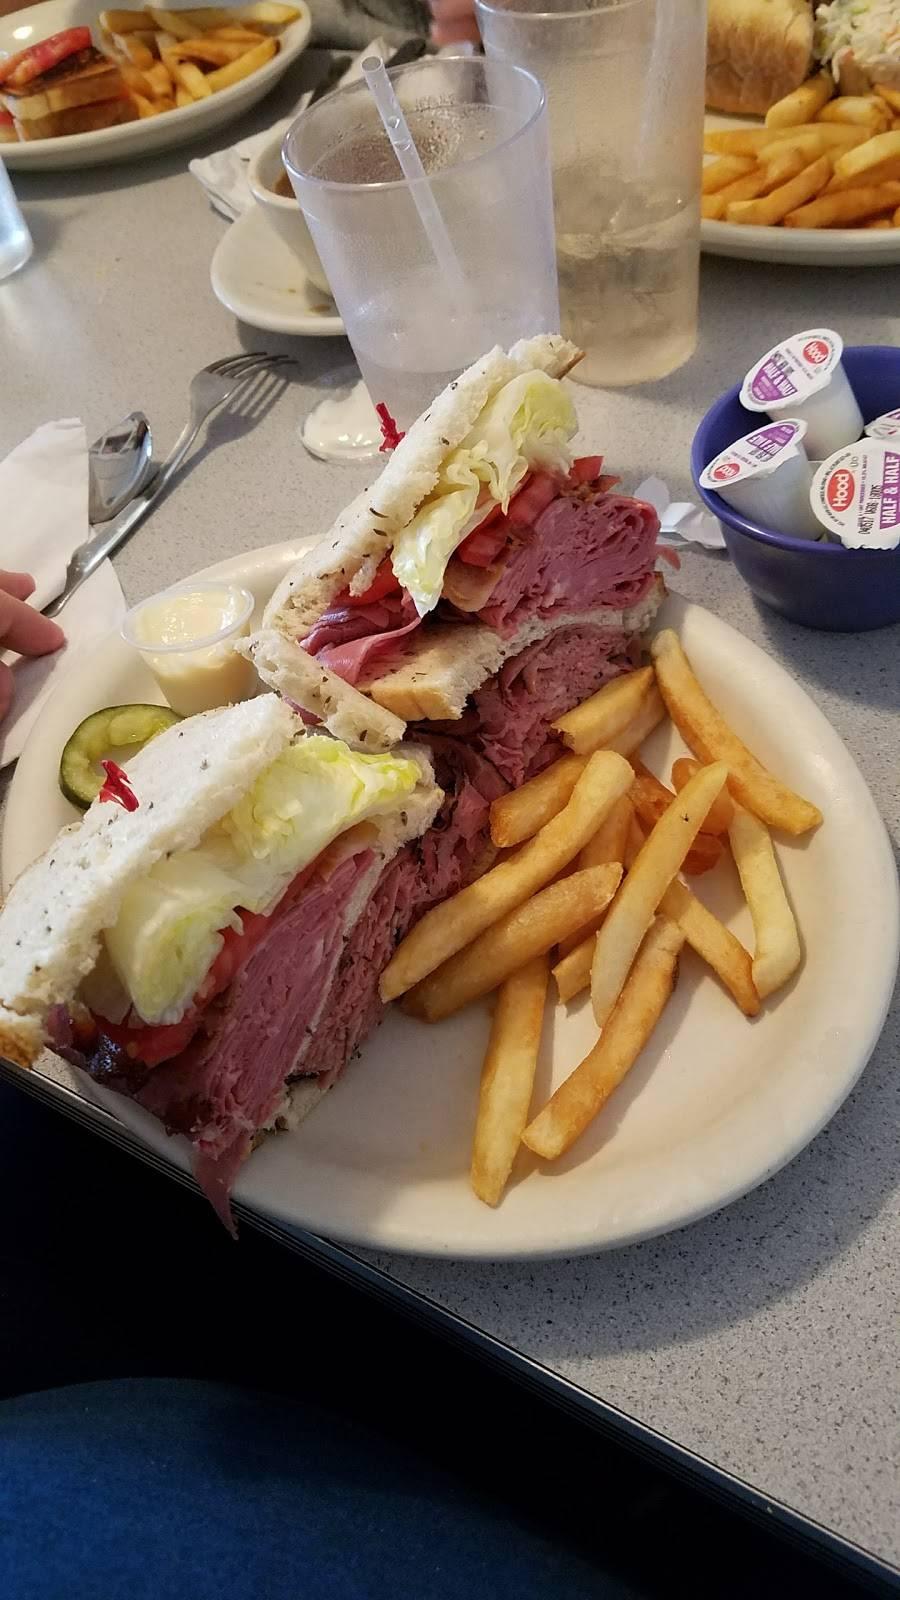 Americana 50s Diner | restaurant | 1730 US-19, Holiday, FL 34691, USA | 7279427880 OR +1 727-942-7880